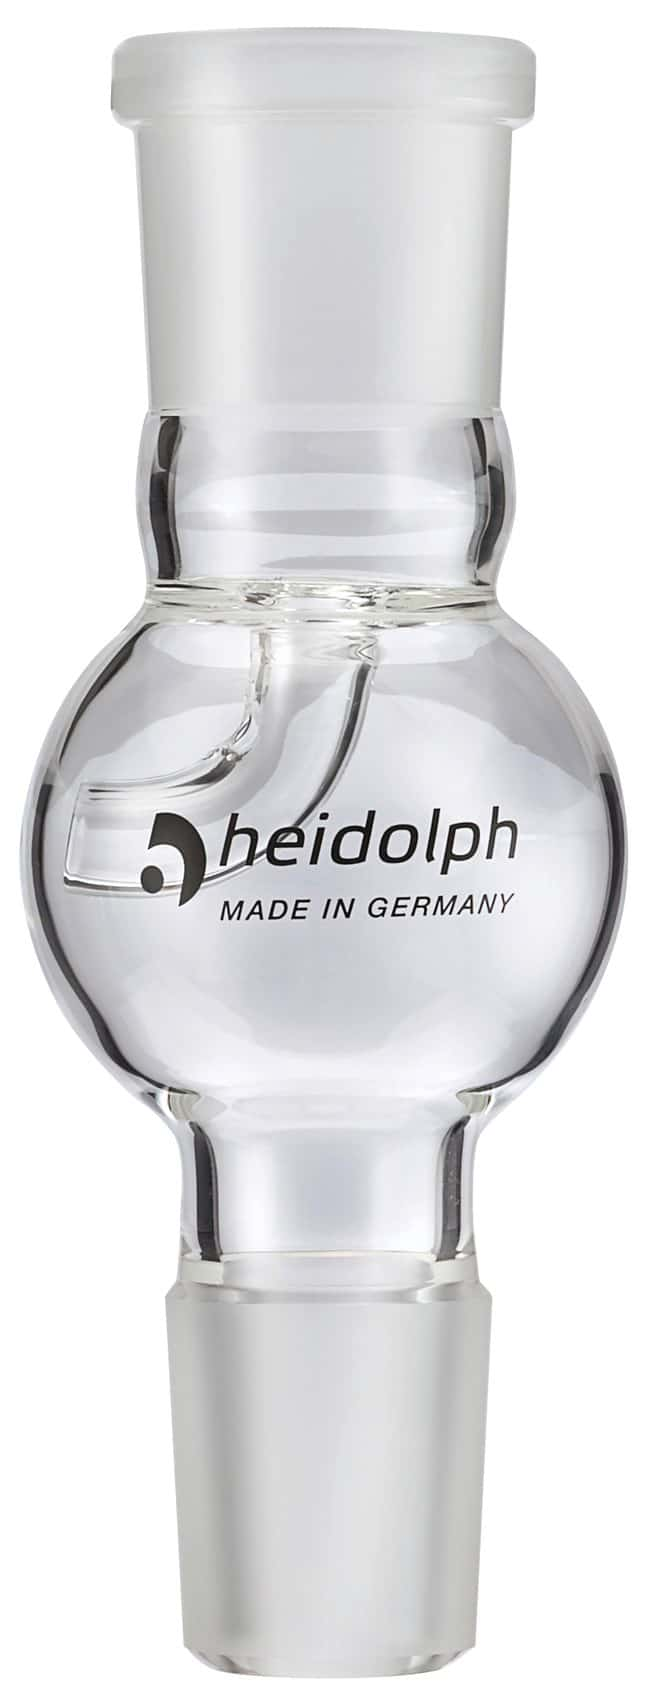 HeidolphRadleys Splash Head 24/40 Socket to B24 Cone:Evaporators